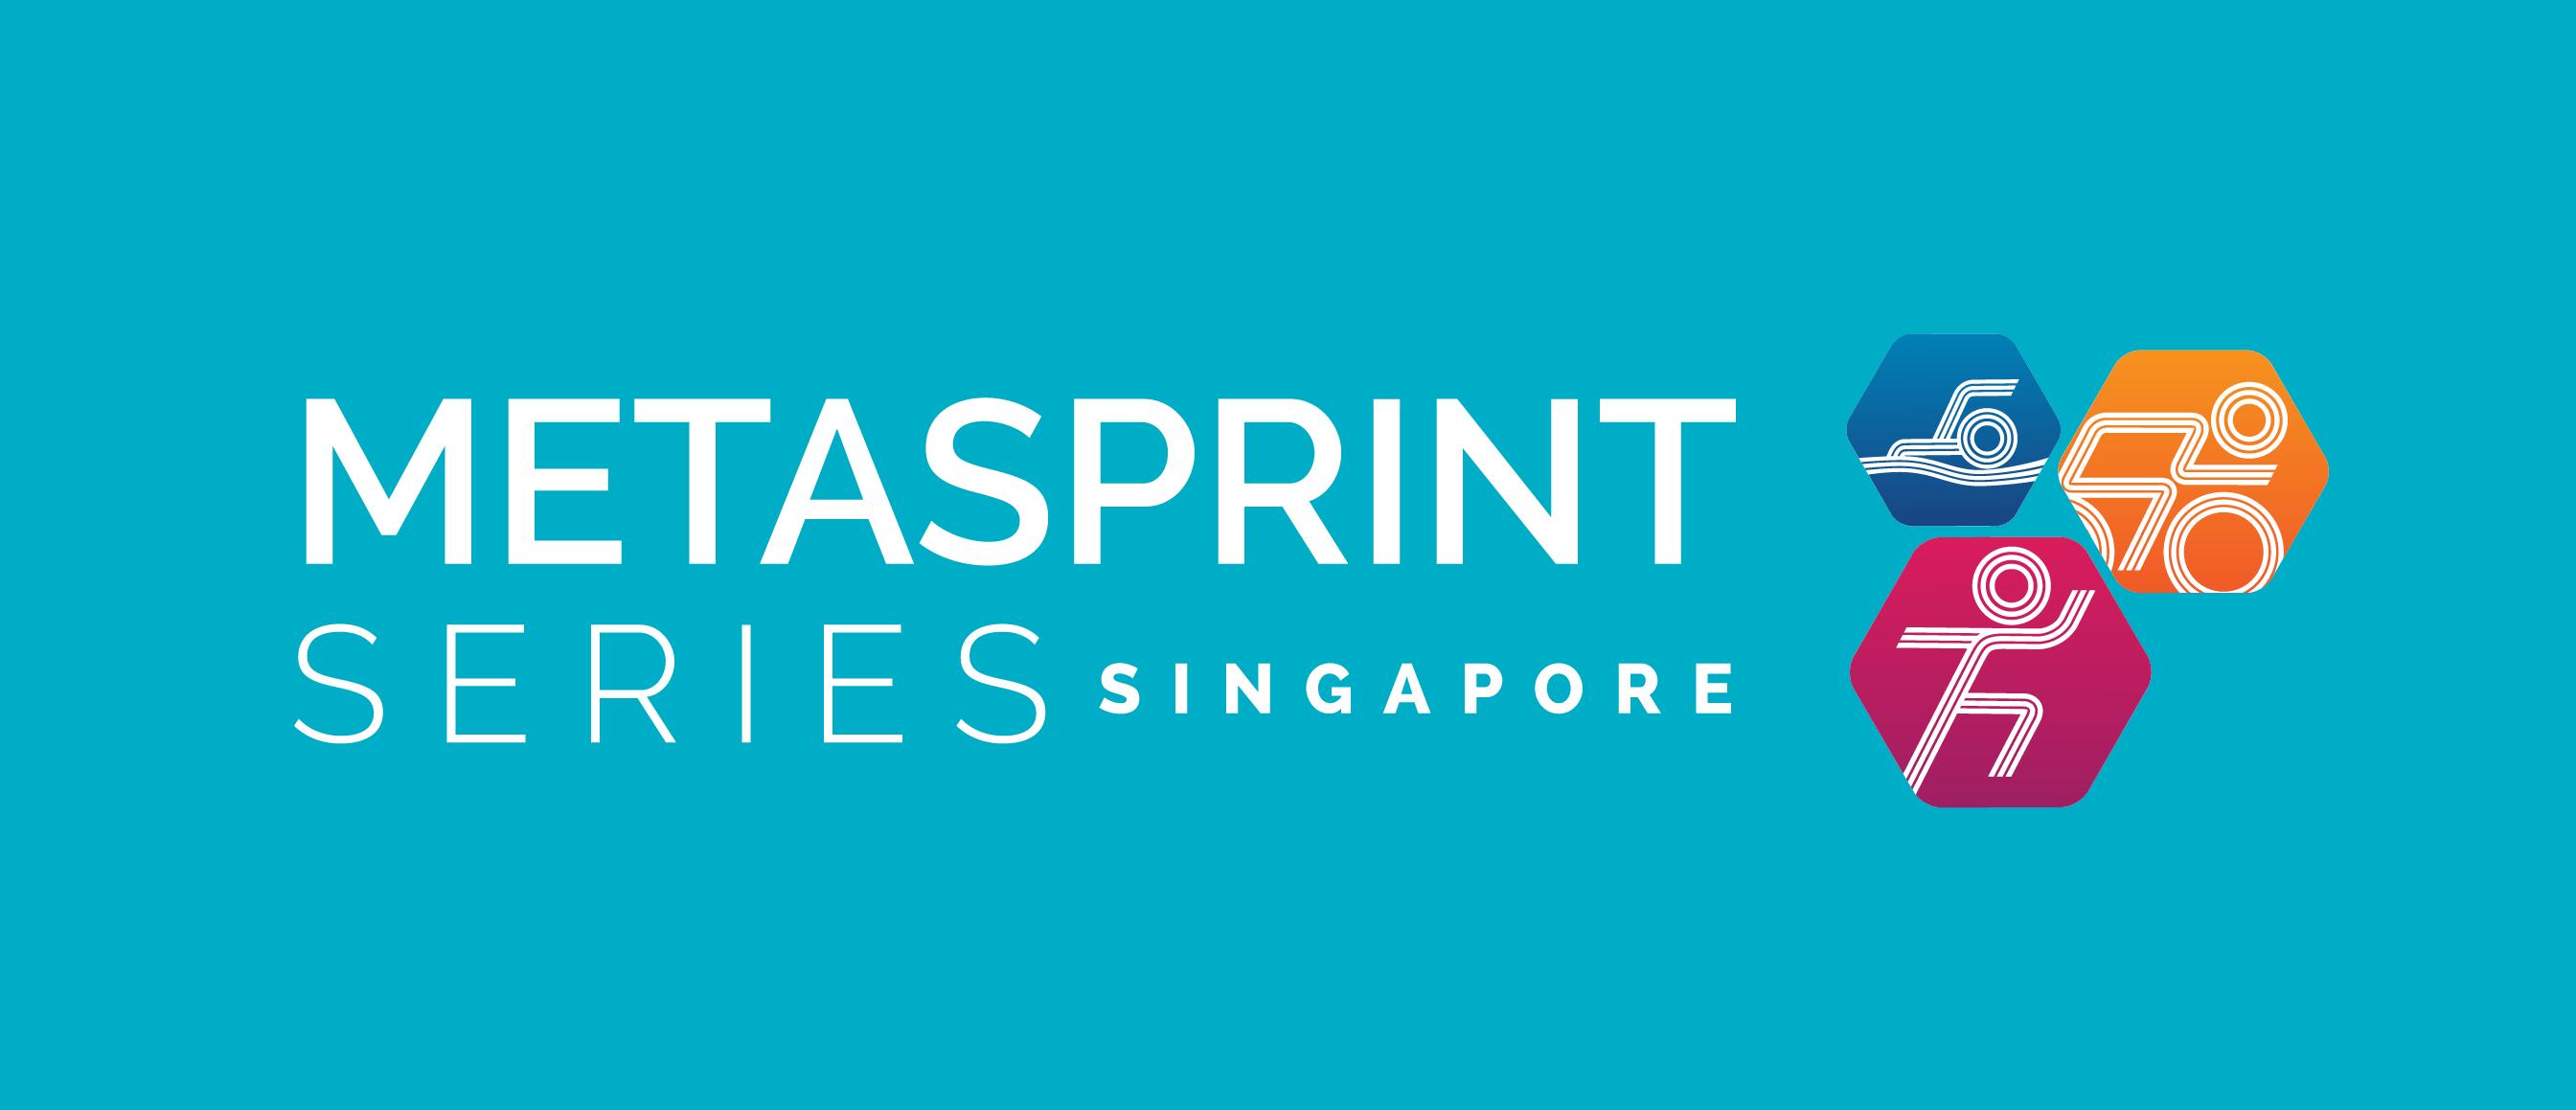 MetaSprint Series